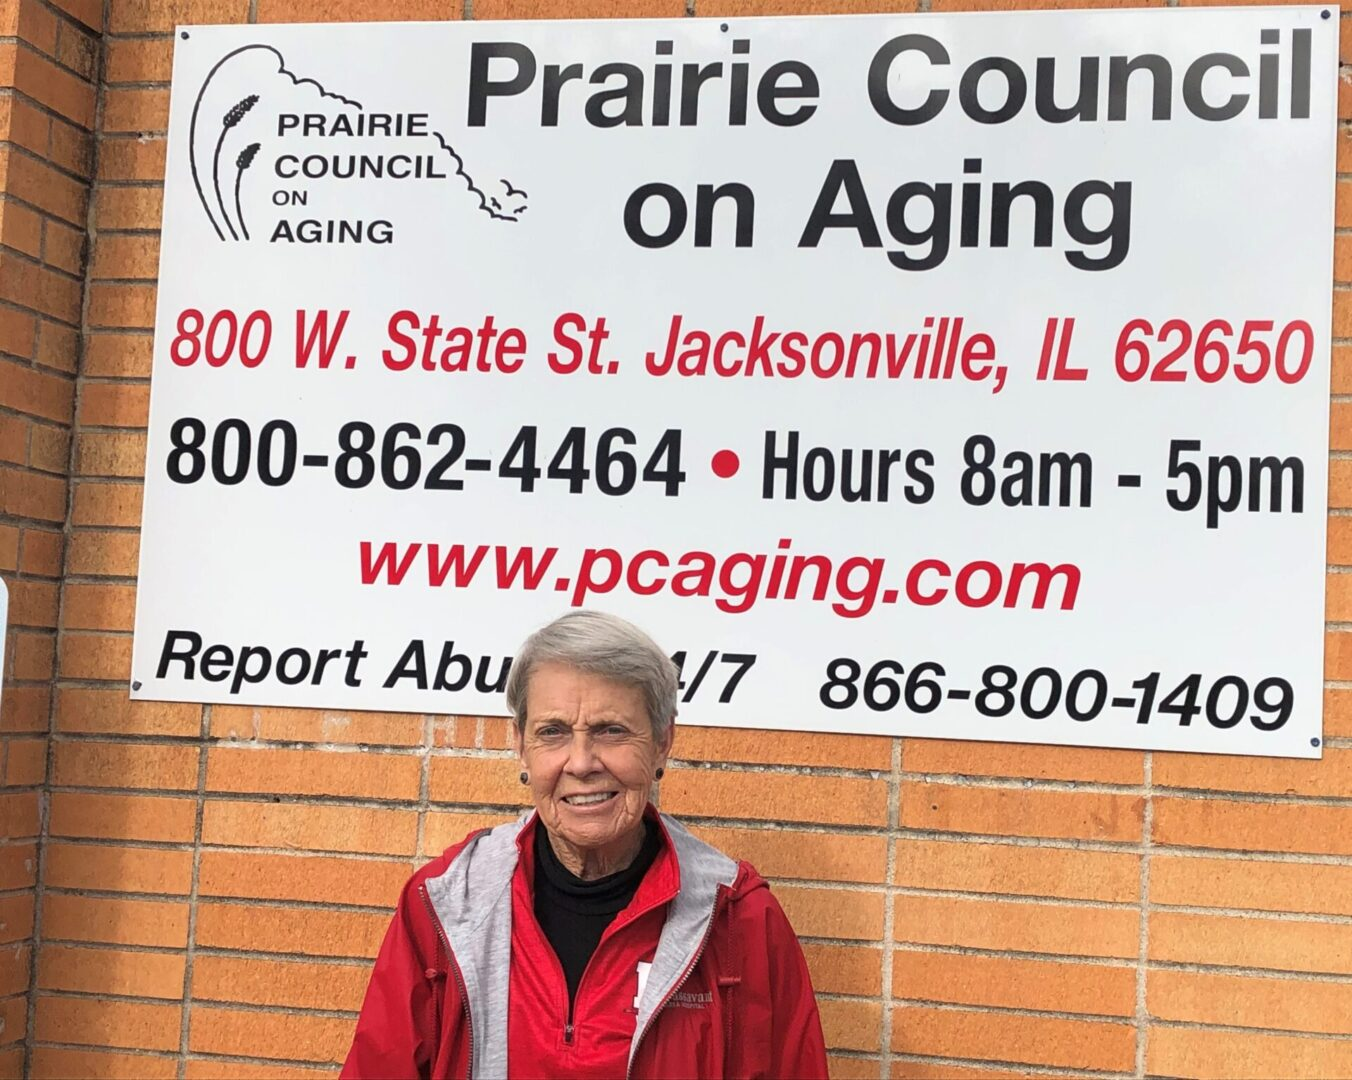 Prairie Council On Aging